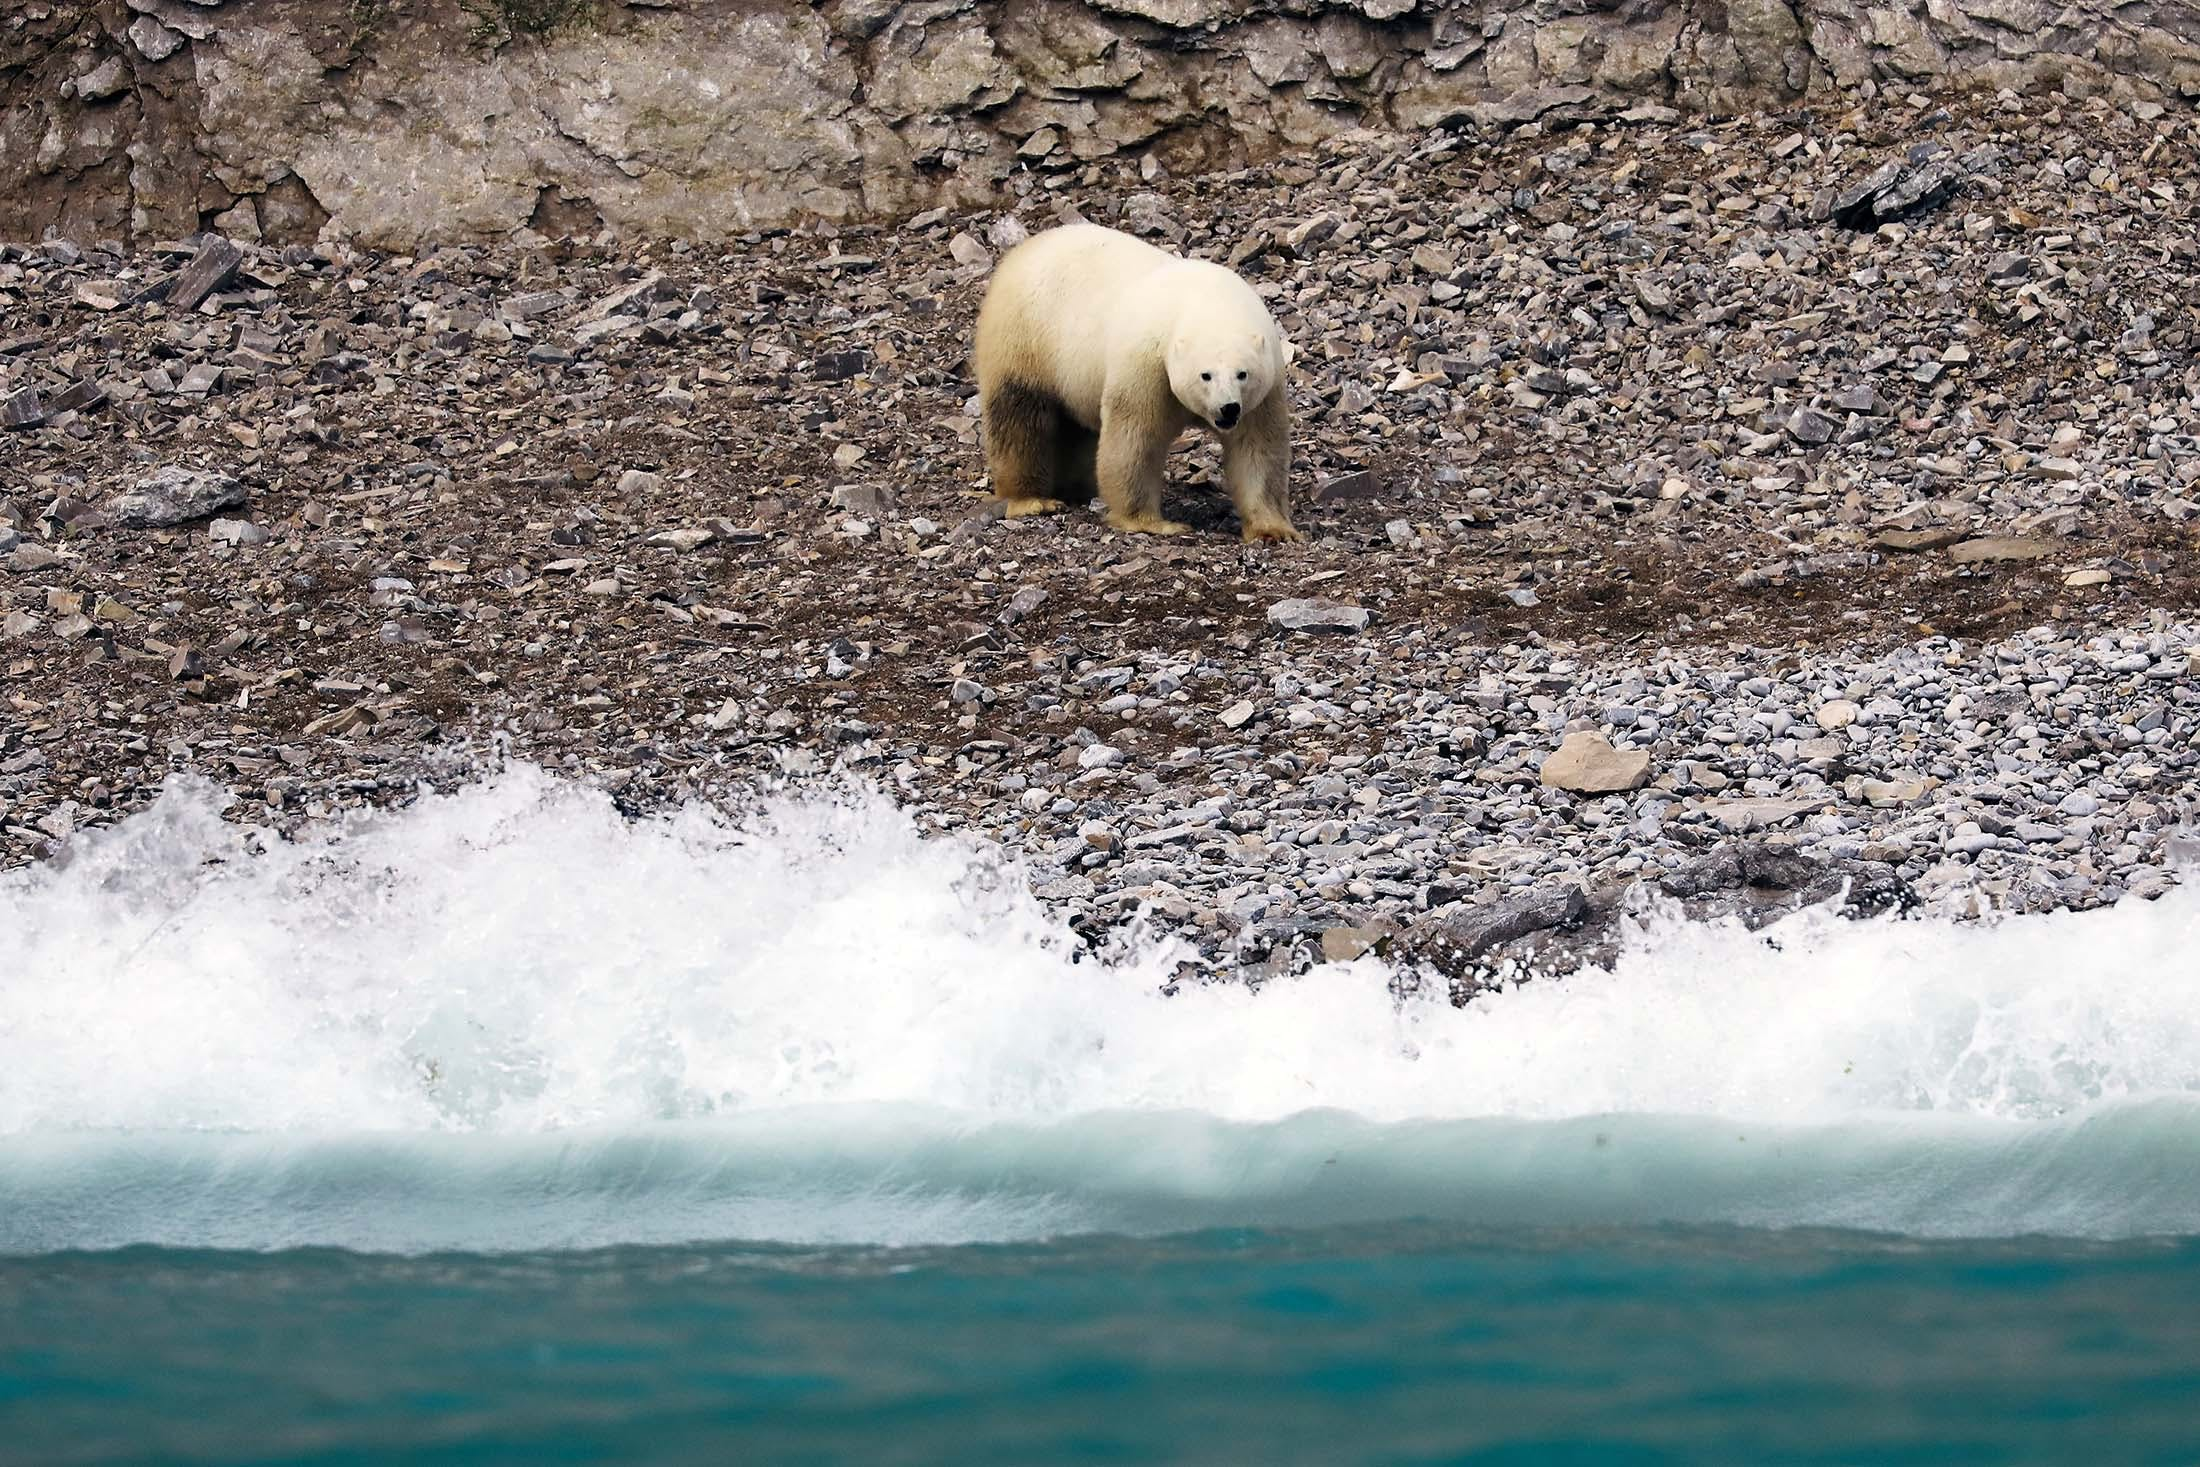 Polar bear in Akpatok Island, Greenland